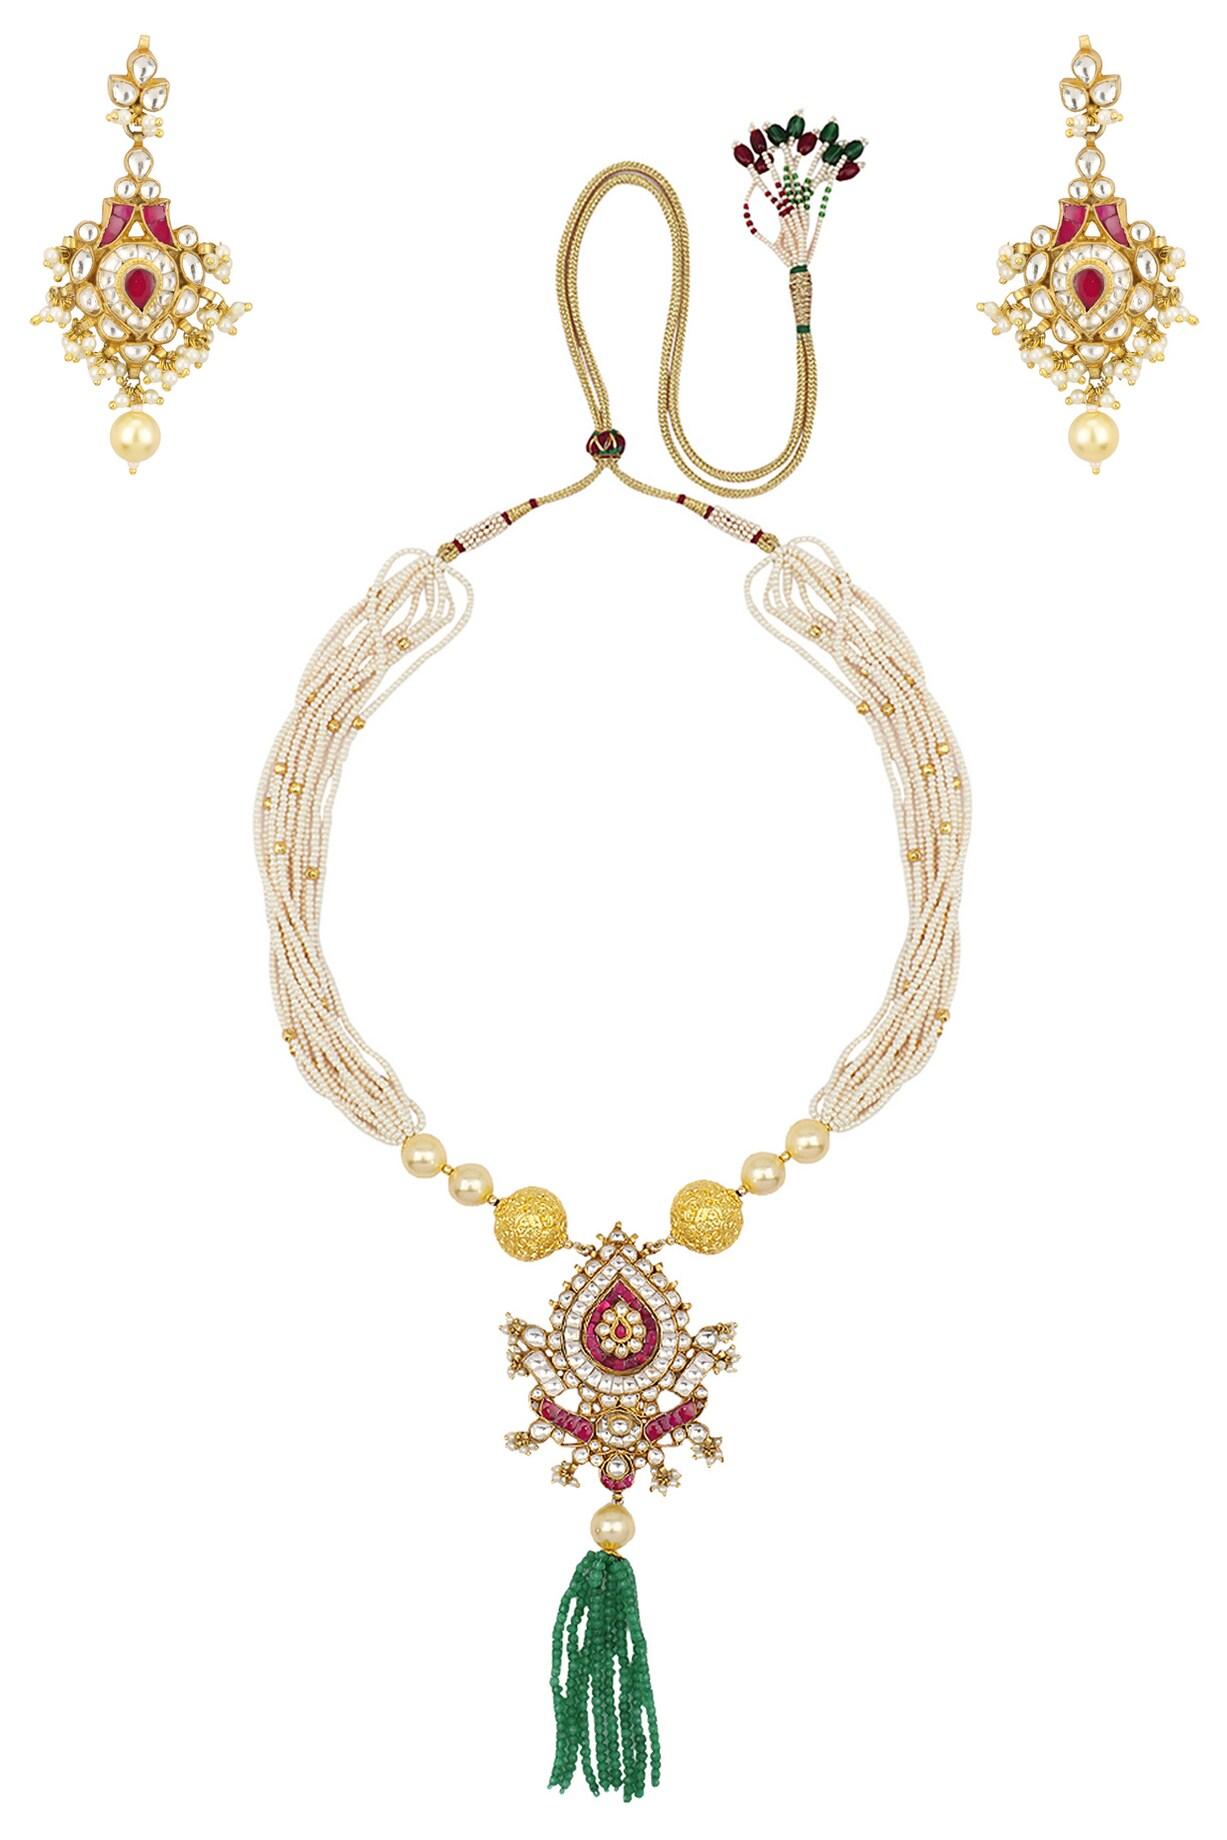 Riana Jewellery Necklaces